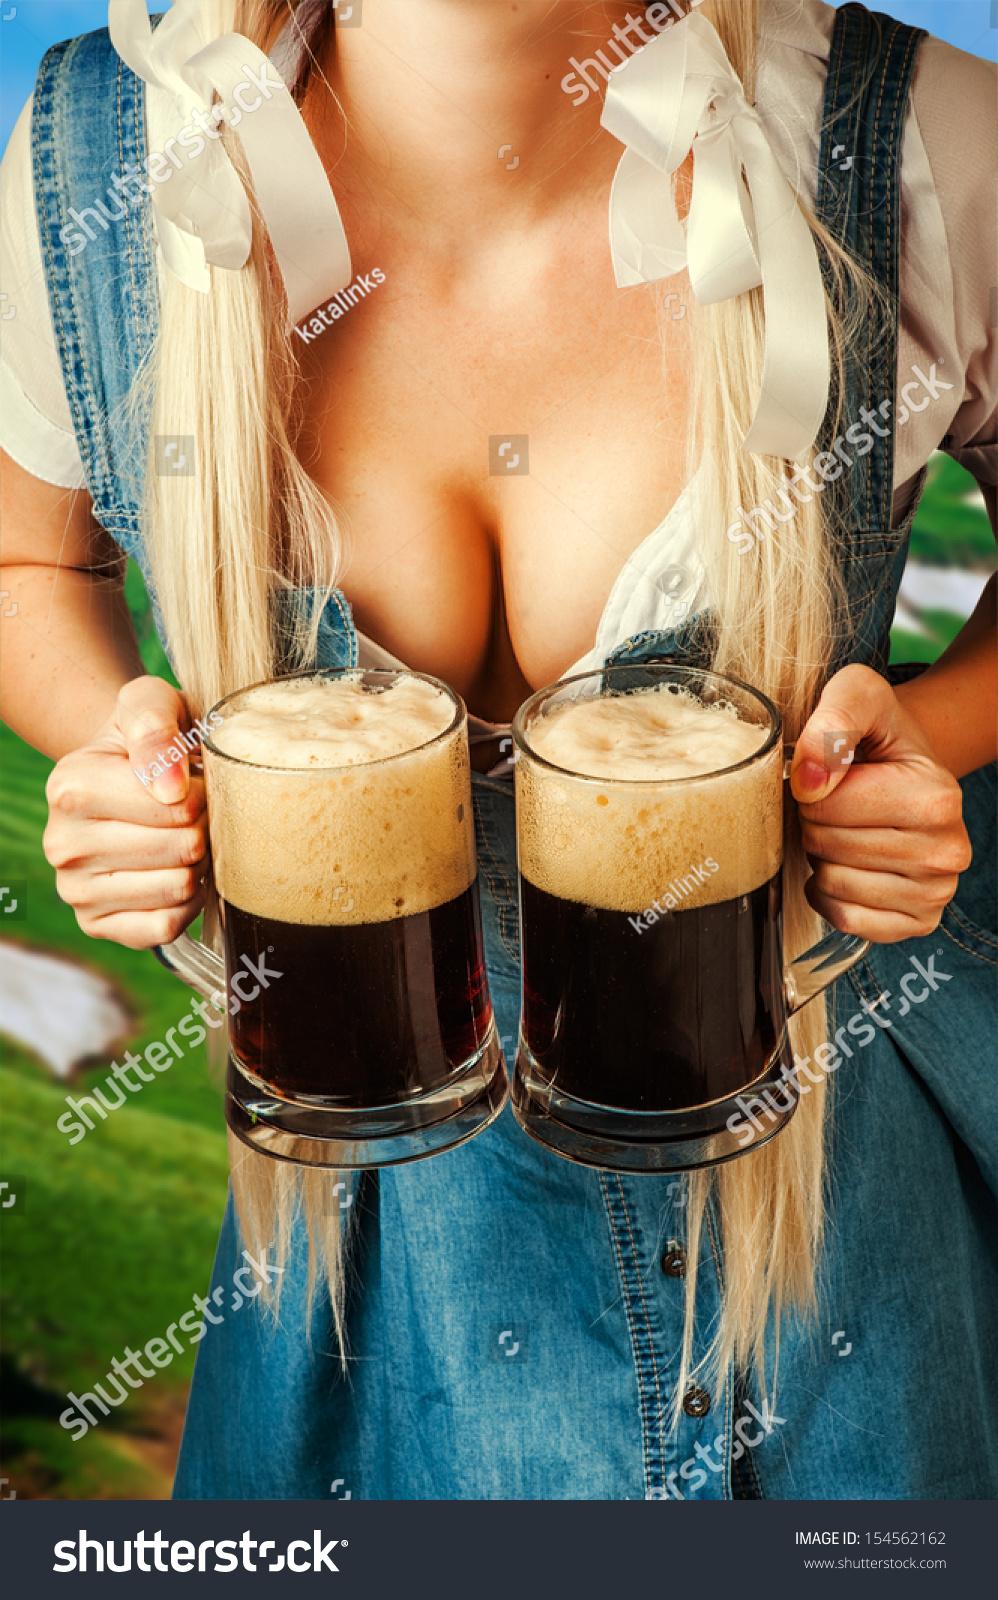 Young Sexy Oktoberfest Woman Wearing Dirndl Stock Photo